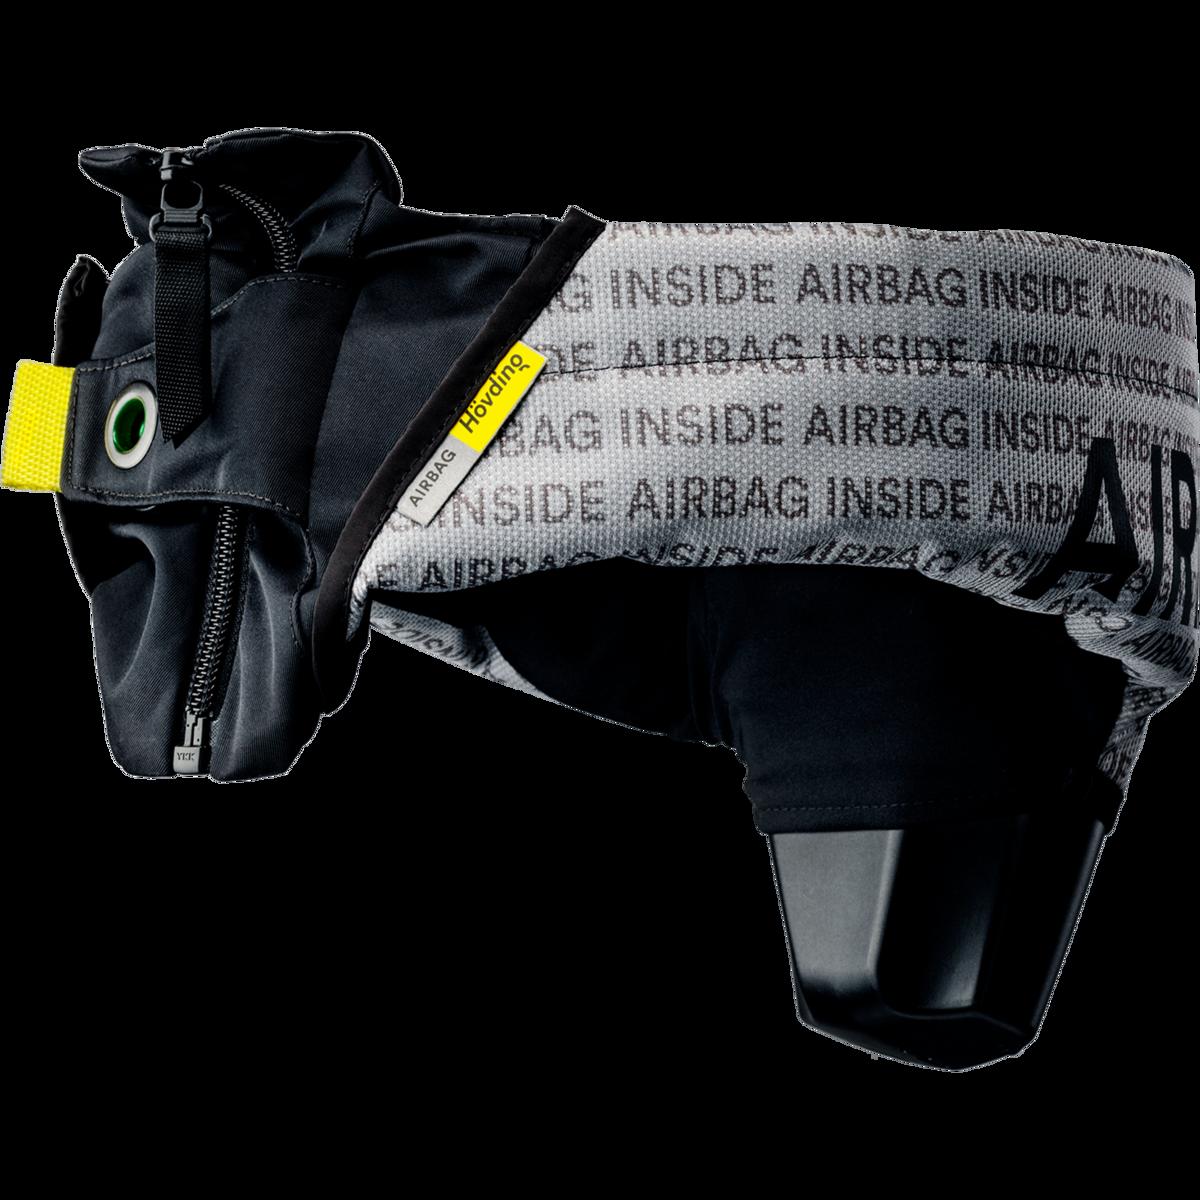 Hövding 3.0 Airbag Cykelhjelm + Refleksiv Airbag Cover